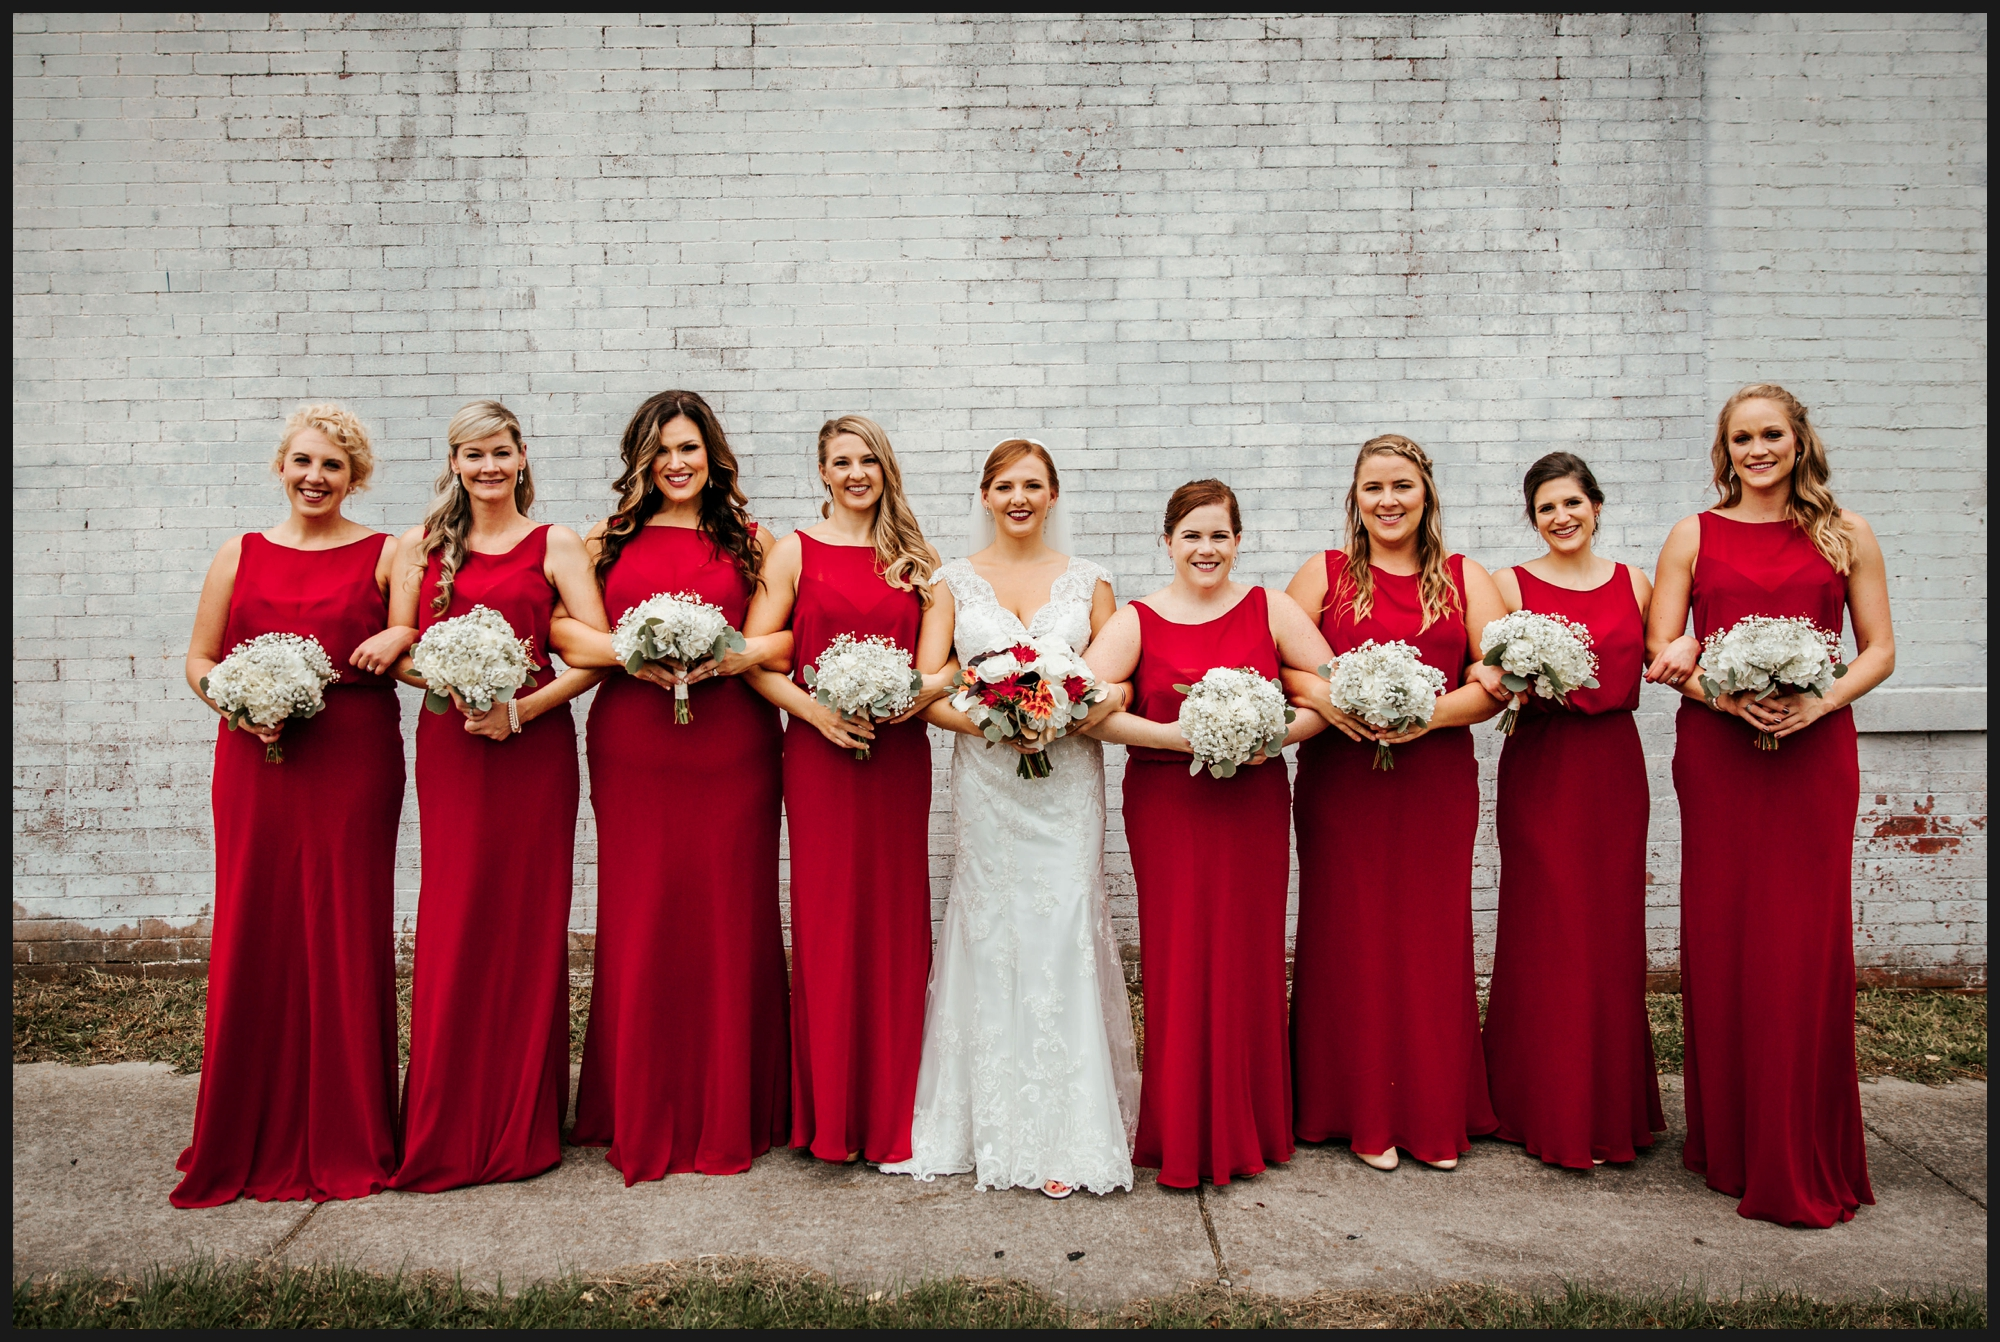 Orlando-Wedding-Photographer-destination-wedding-photographer-florida-wedding-photographer-bohemian-wedding-photographer_0613.jpg